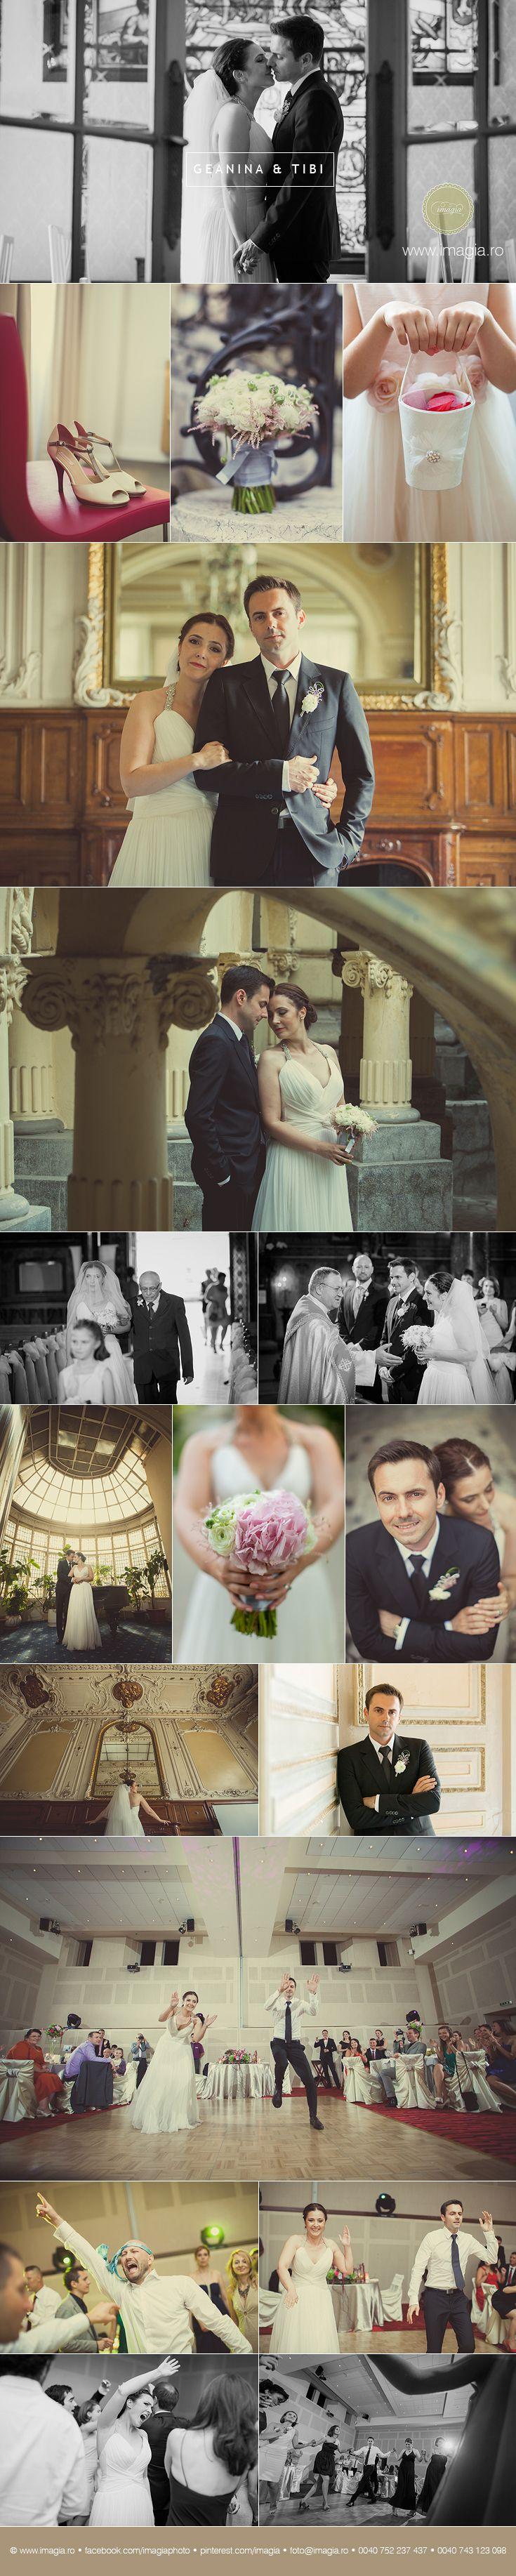 A Romanian wedding with a French twist in Bucharest:  http://www.imagia.ro/blogpage/fotograf-nunta-bucuresti-Tibi-si-Geanina-imagia  © IMAGIA / www.imagia.ro